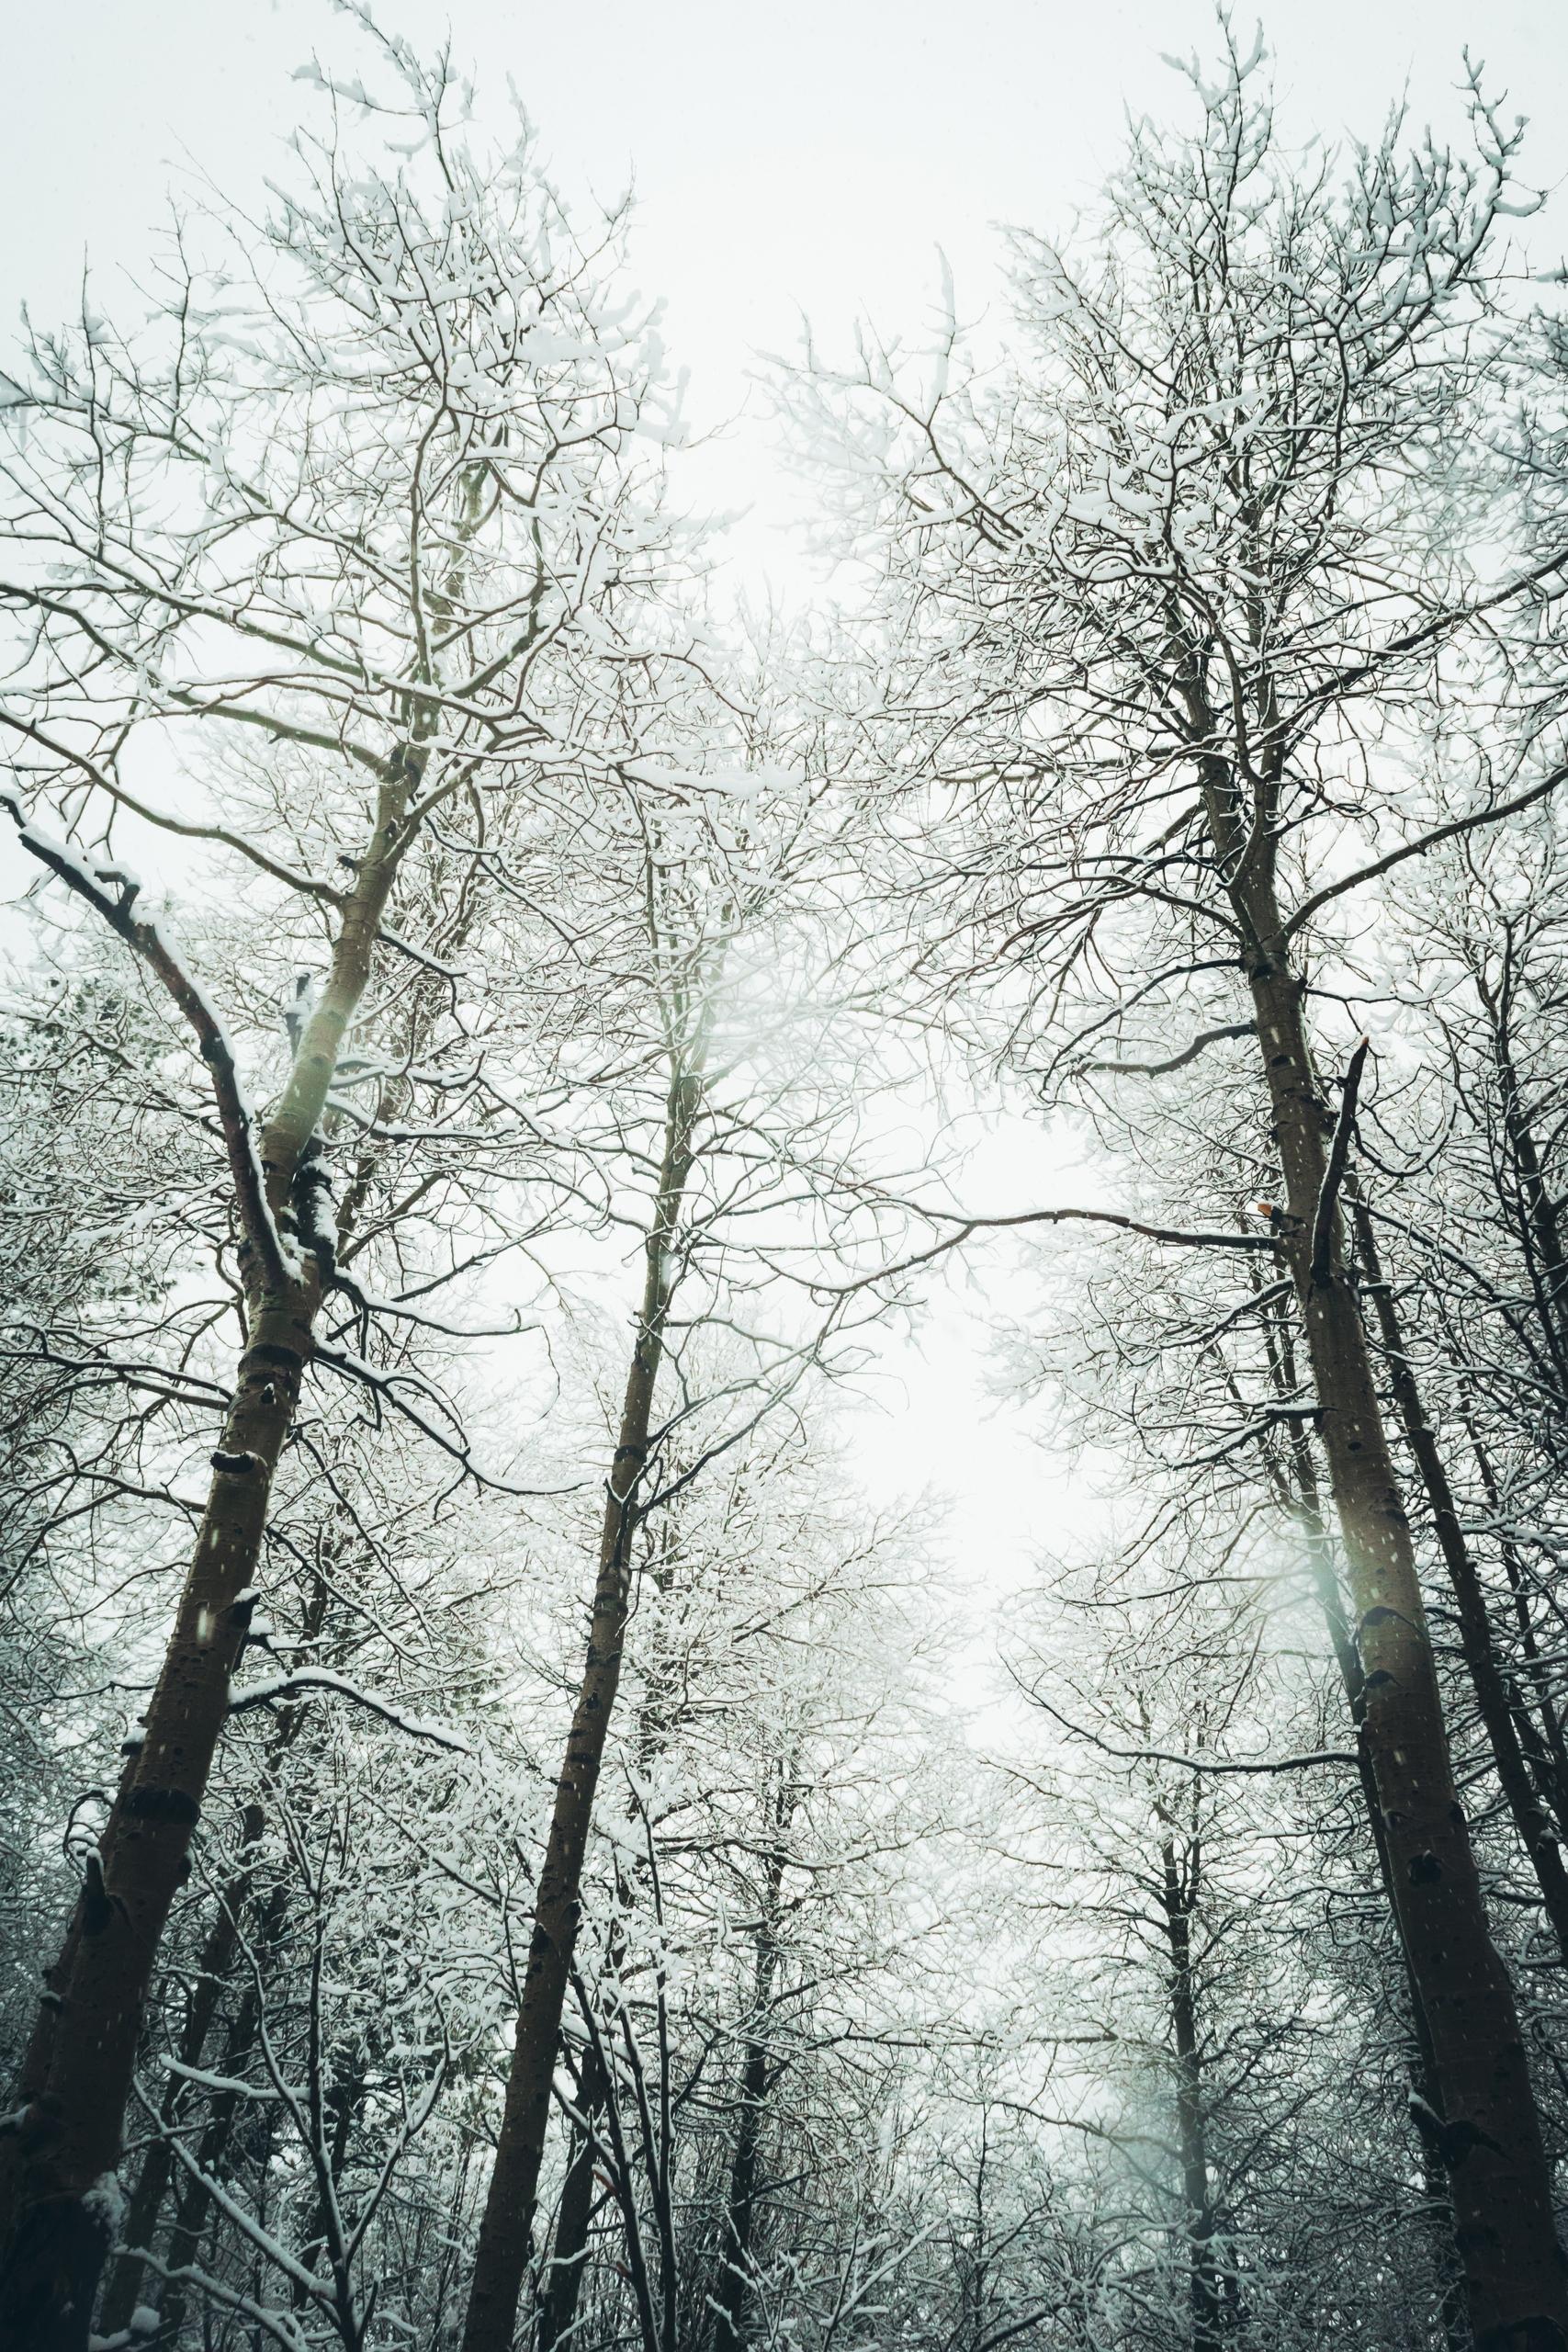 Frozen trapped winter forest. s - brotherkehn | ello